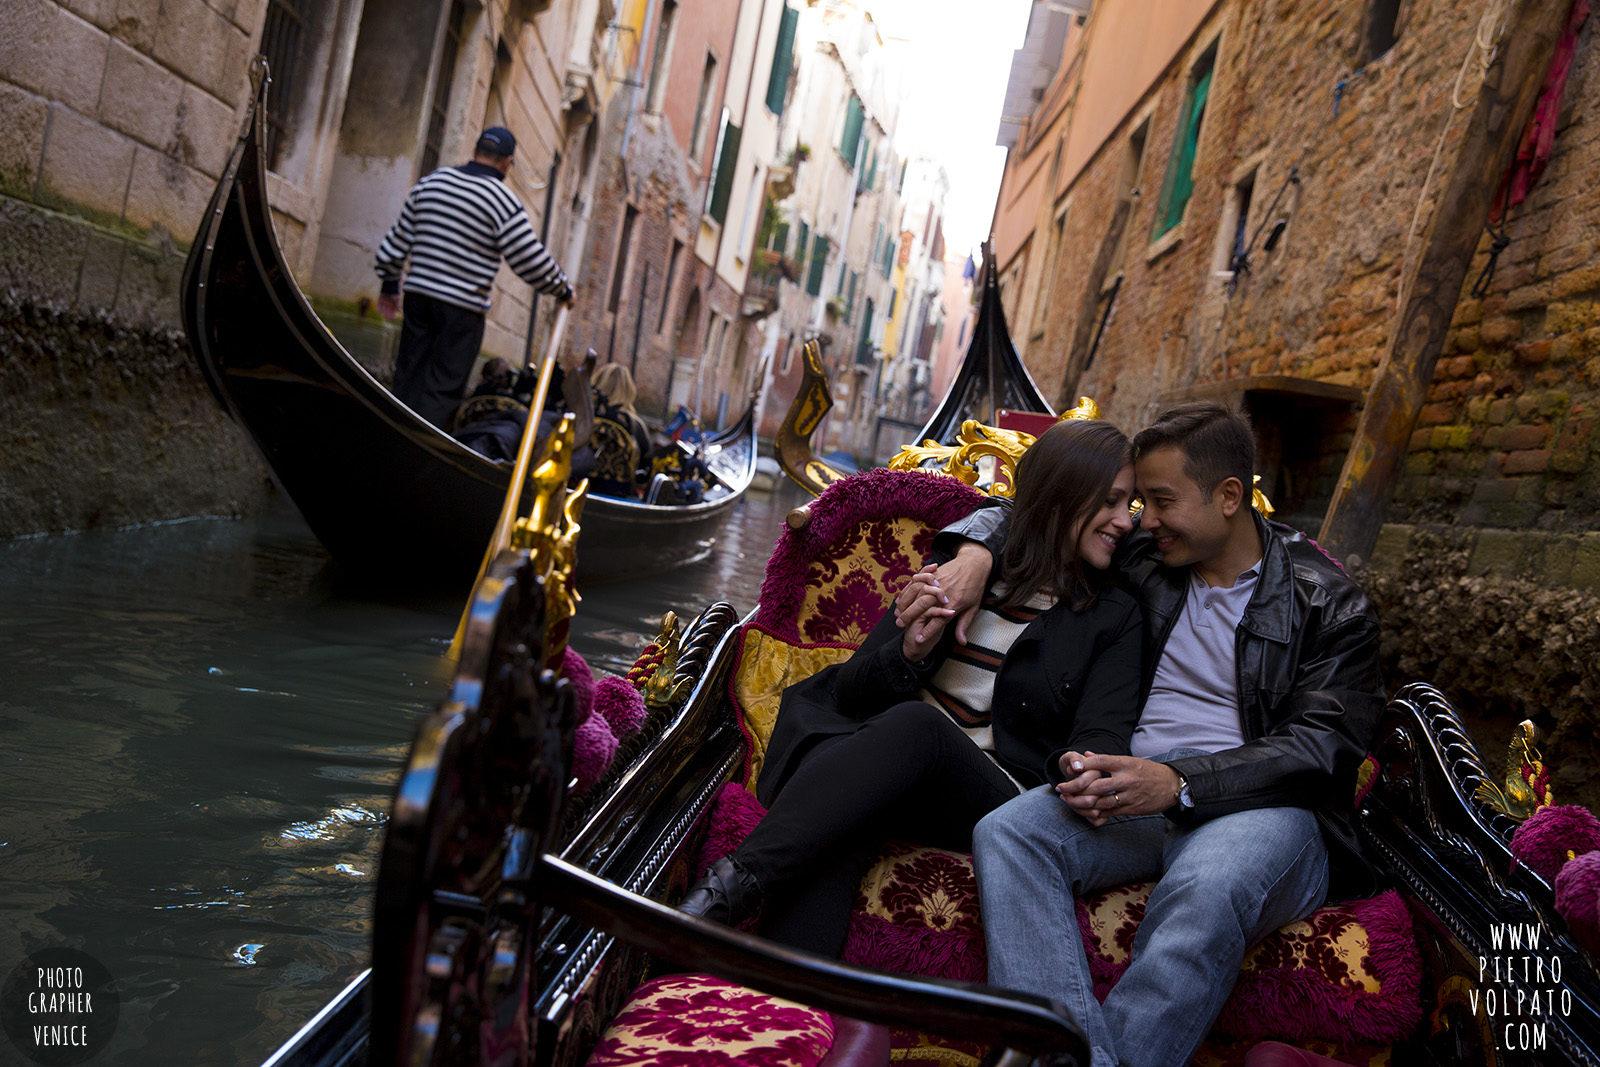 photographer-venice-honeymoon-couple-romantic-vacation-pictures-20170309_03